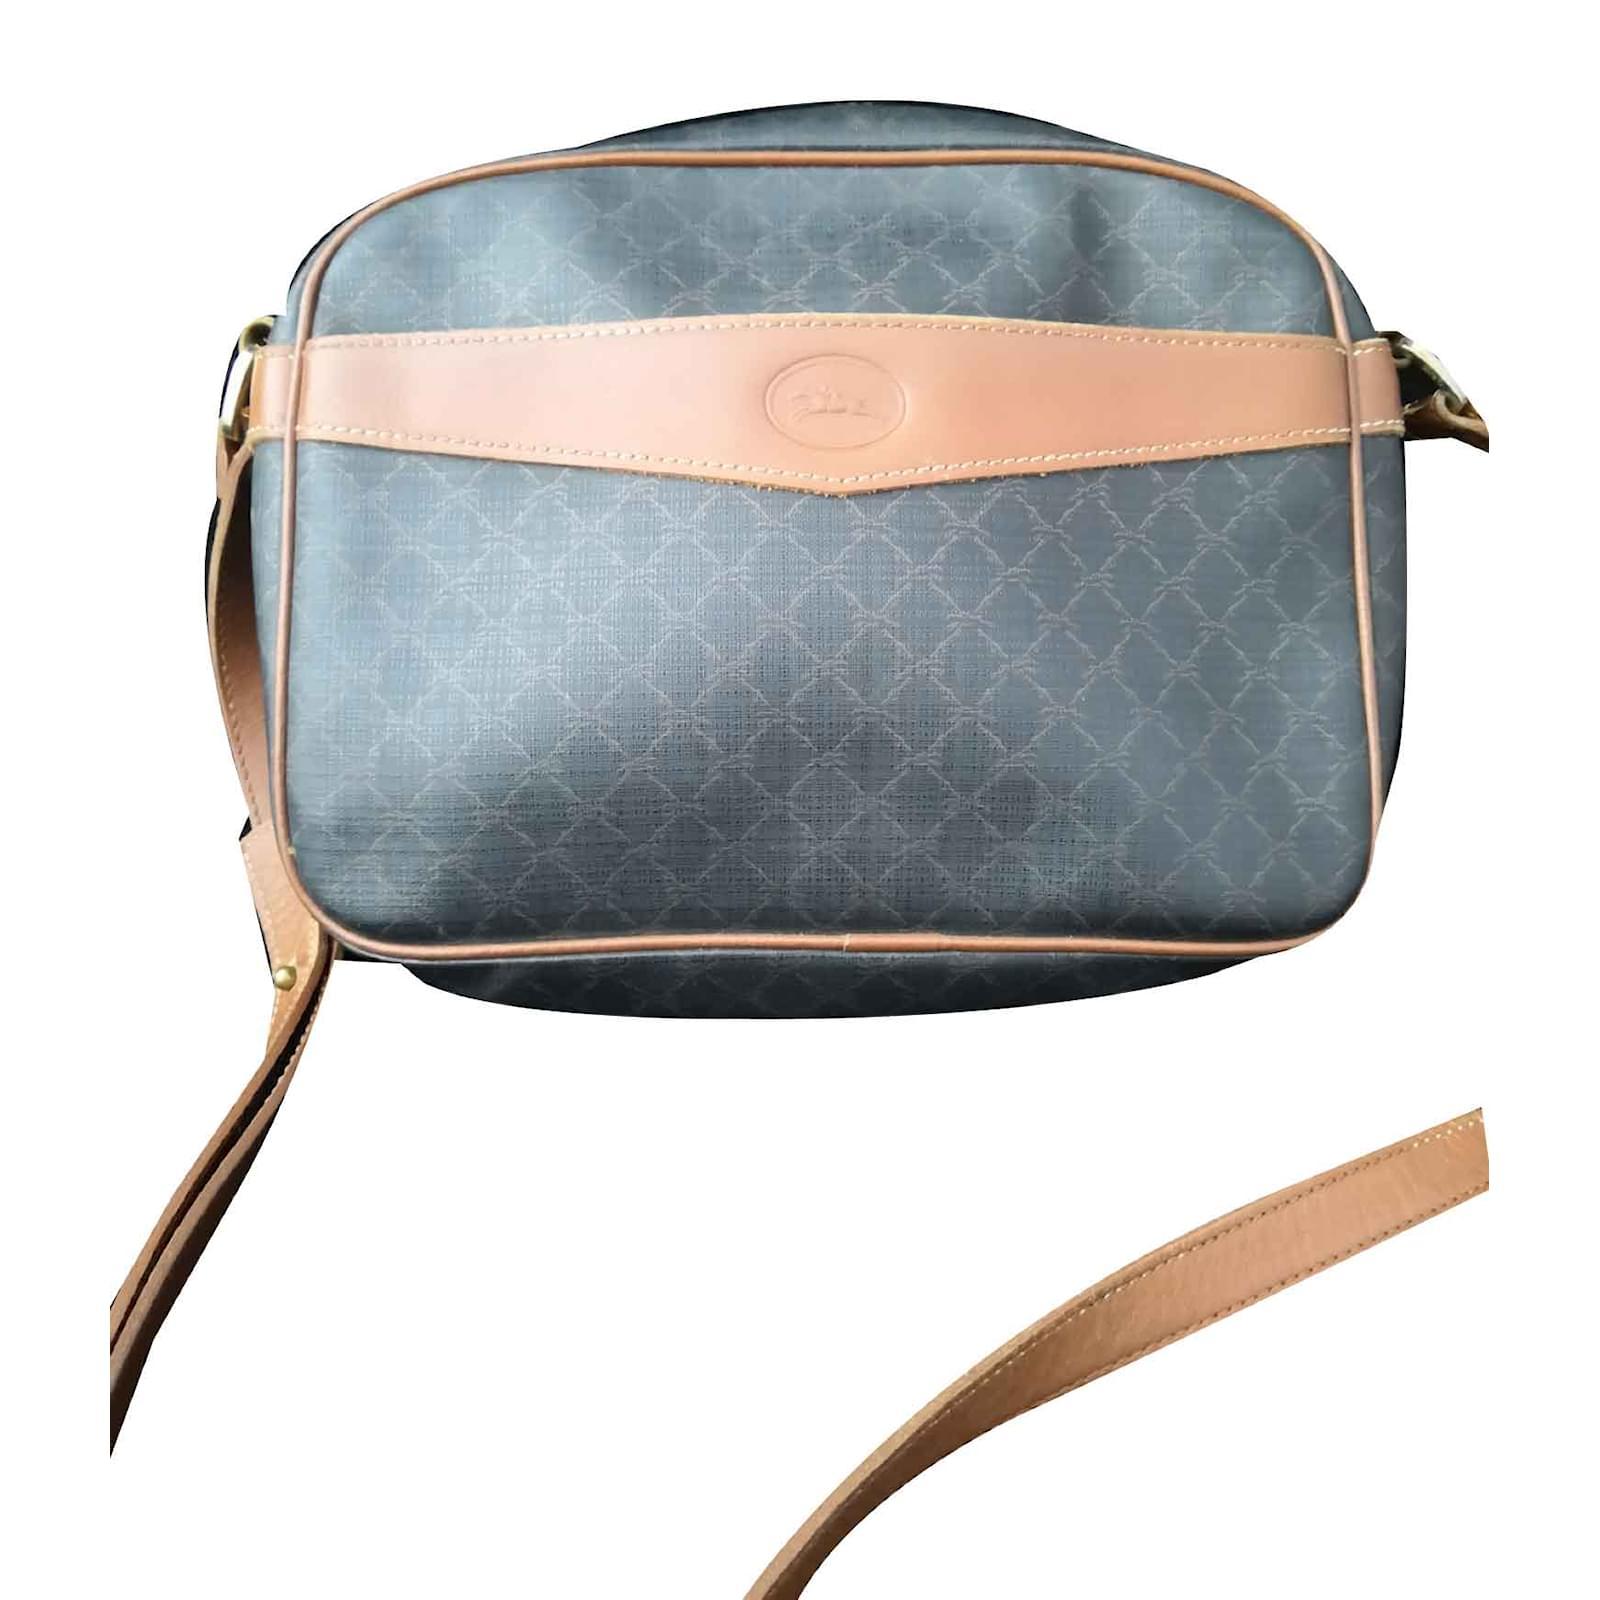 Joli sac Longchamp vintage